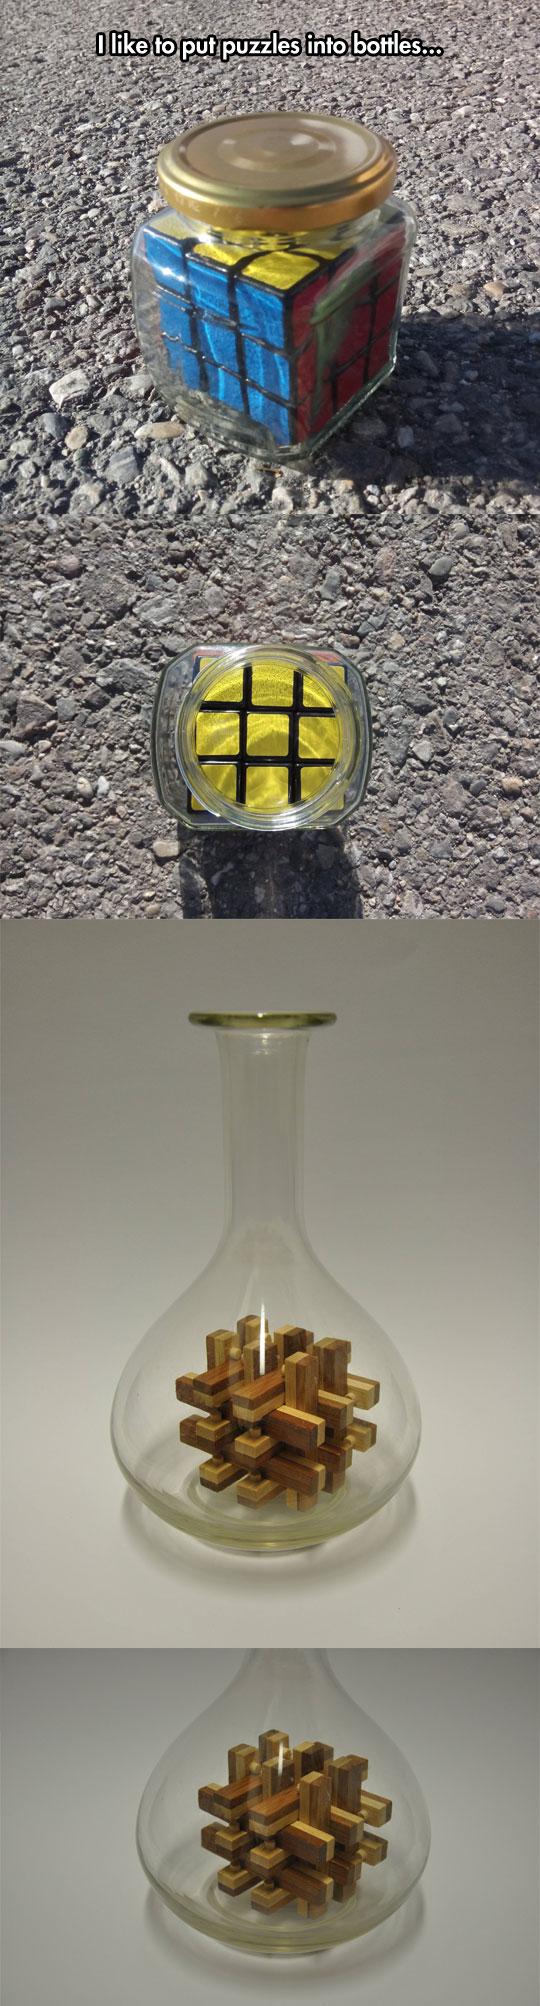 cool-puzzle-inside-bottle-illusion